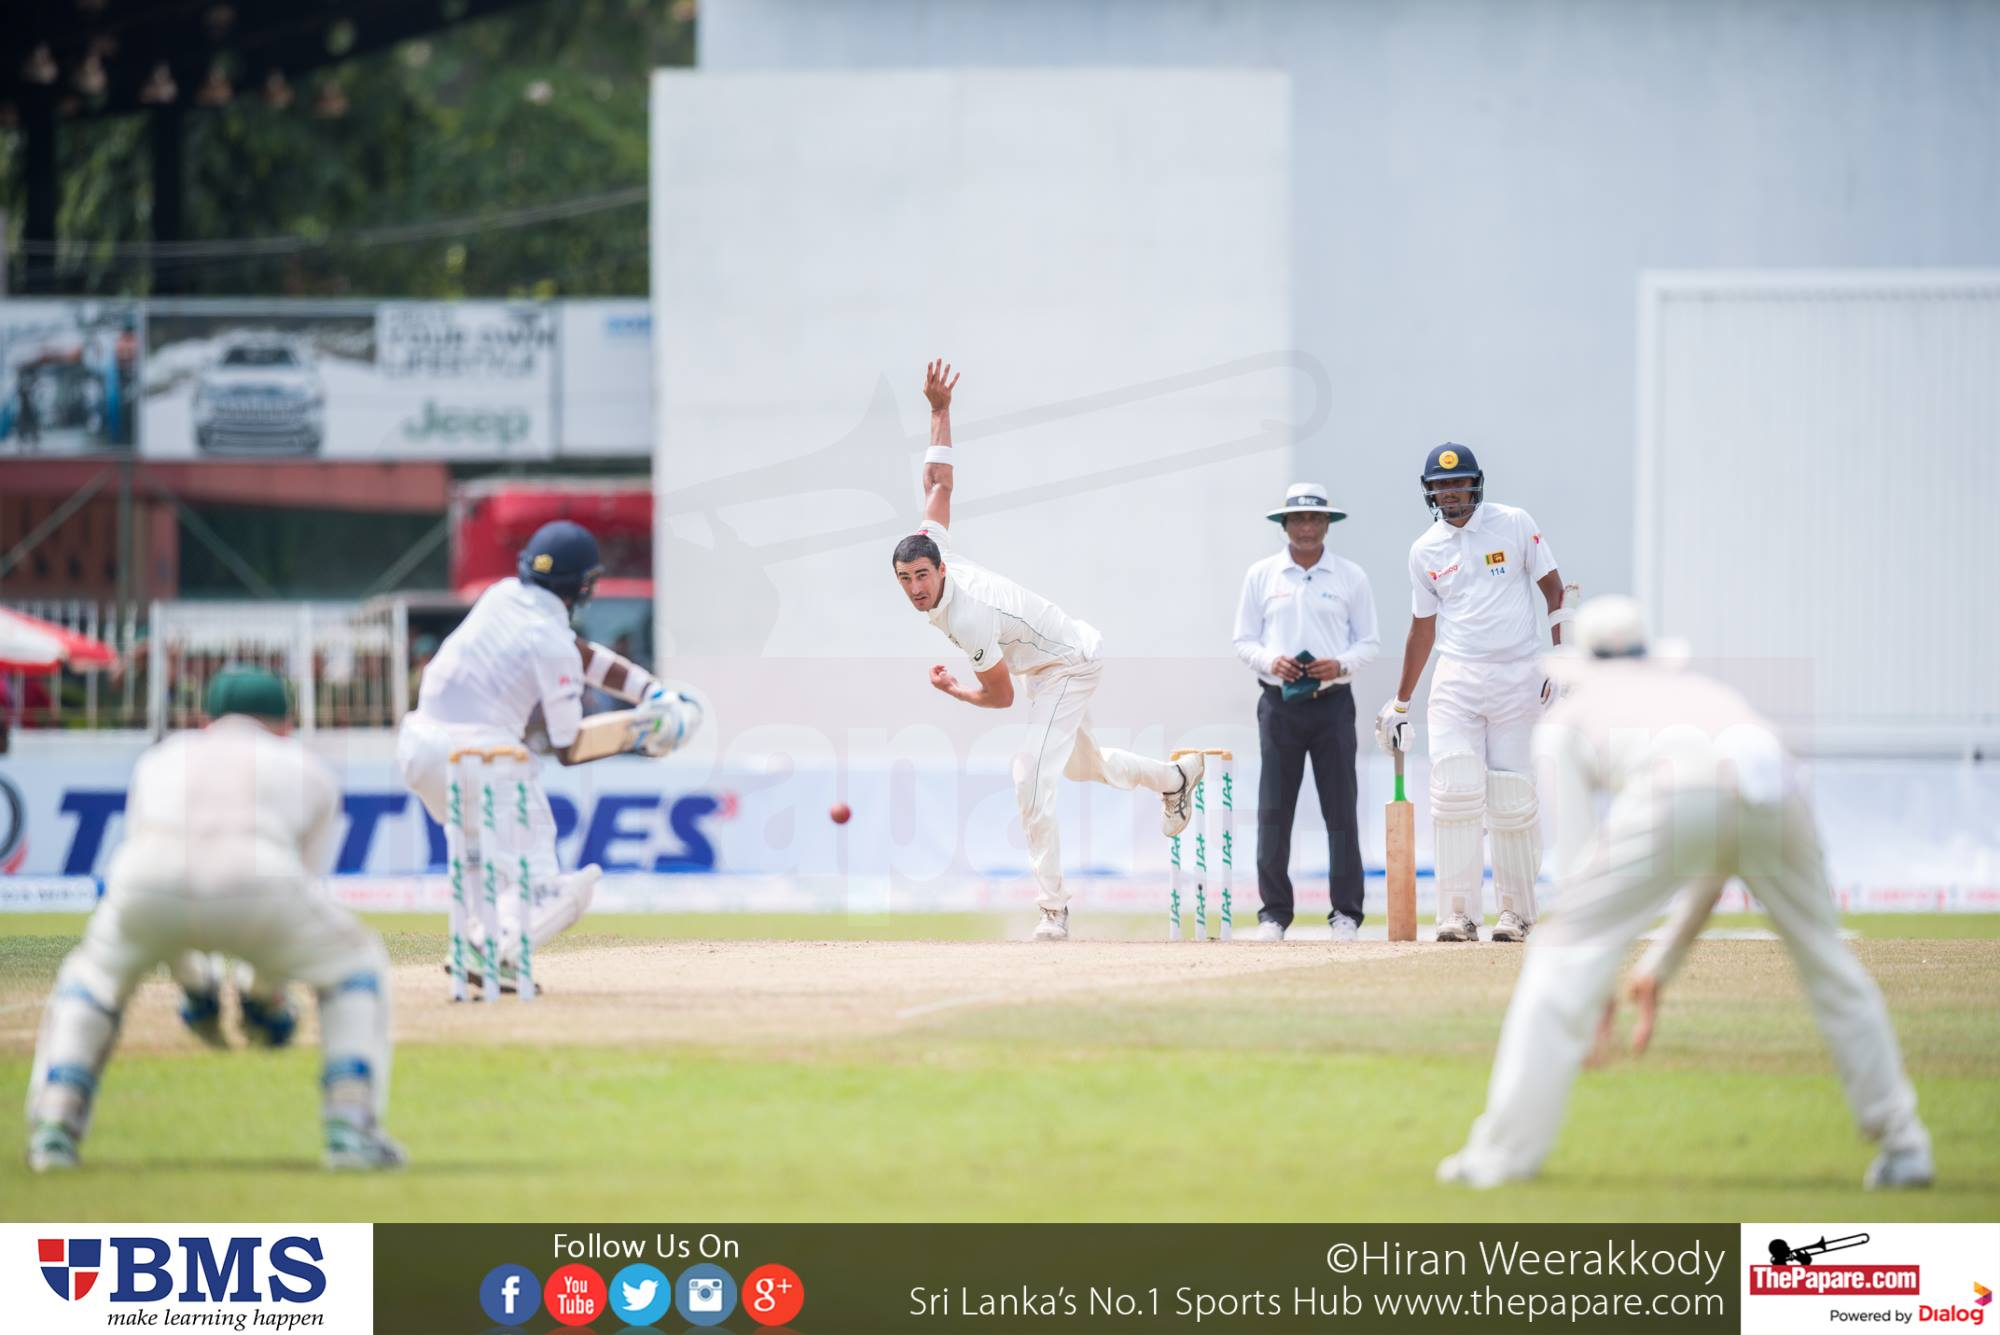 Cricket – is it a fair sport?